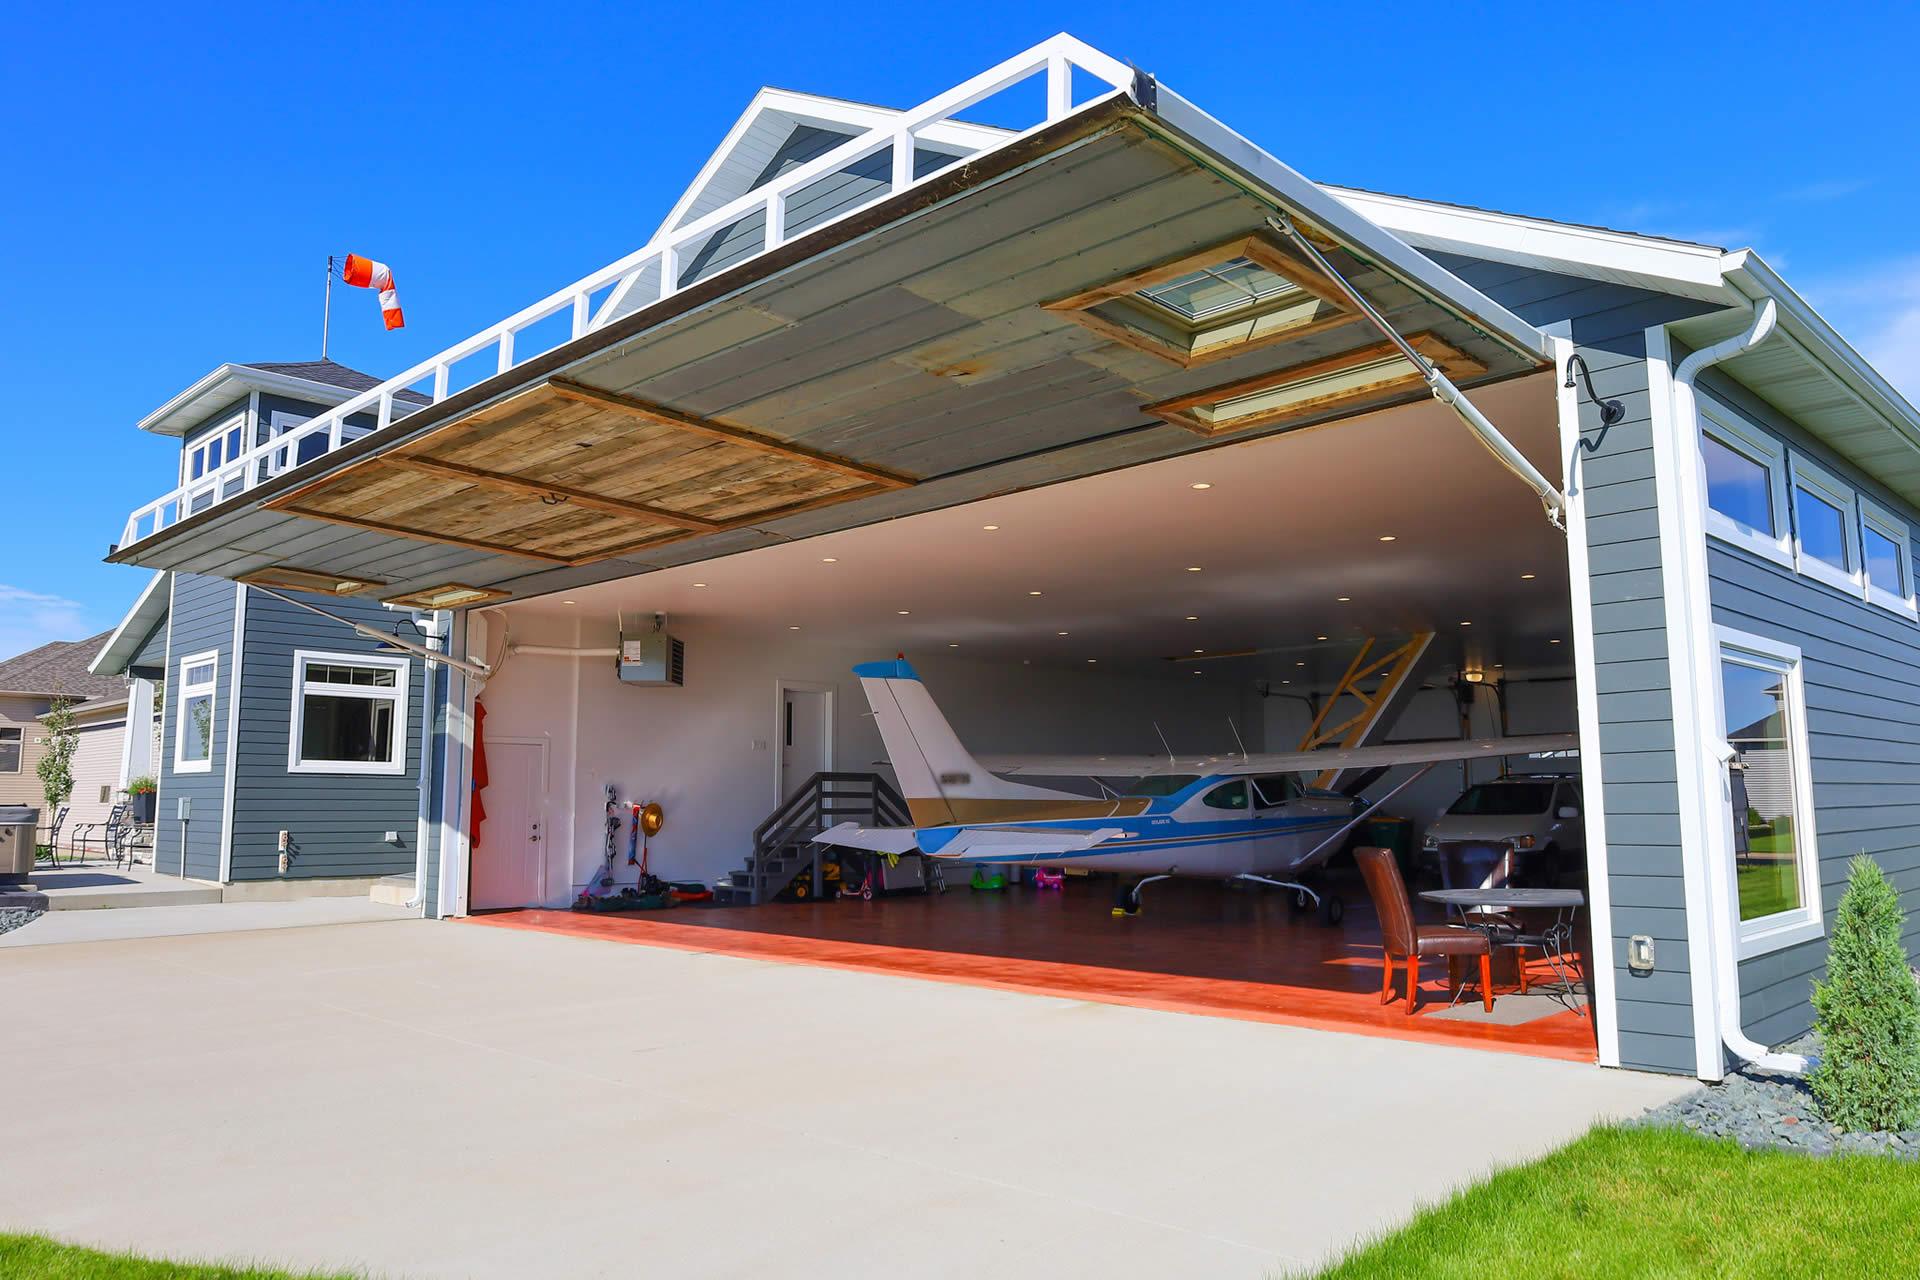 Hangar Home With Antique Trim Elements